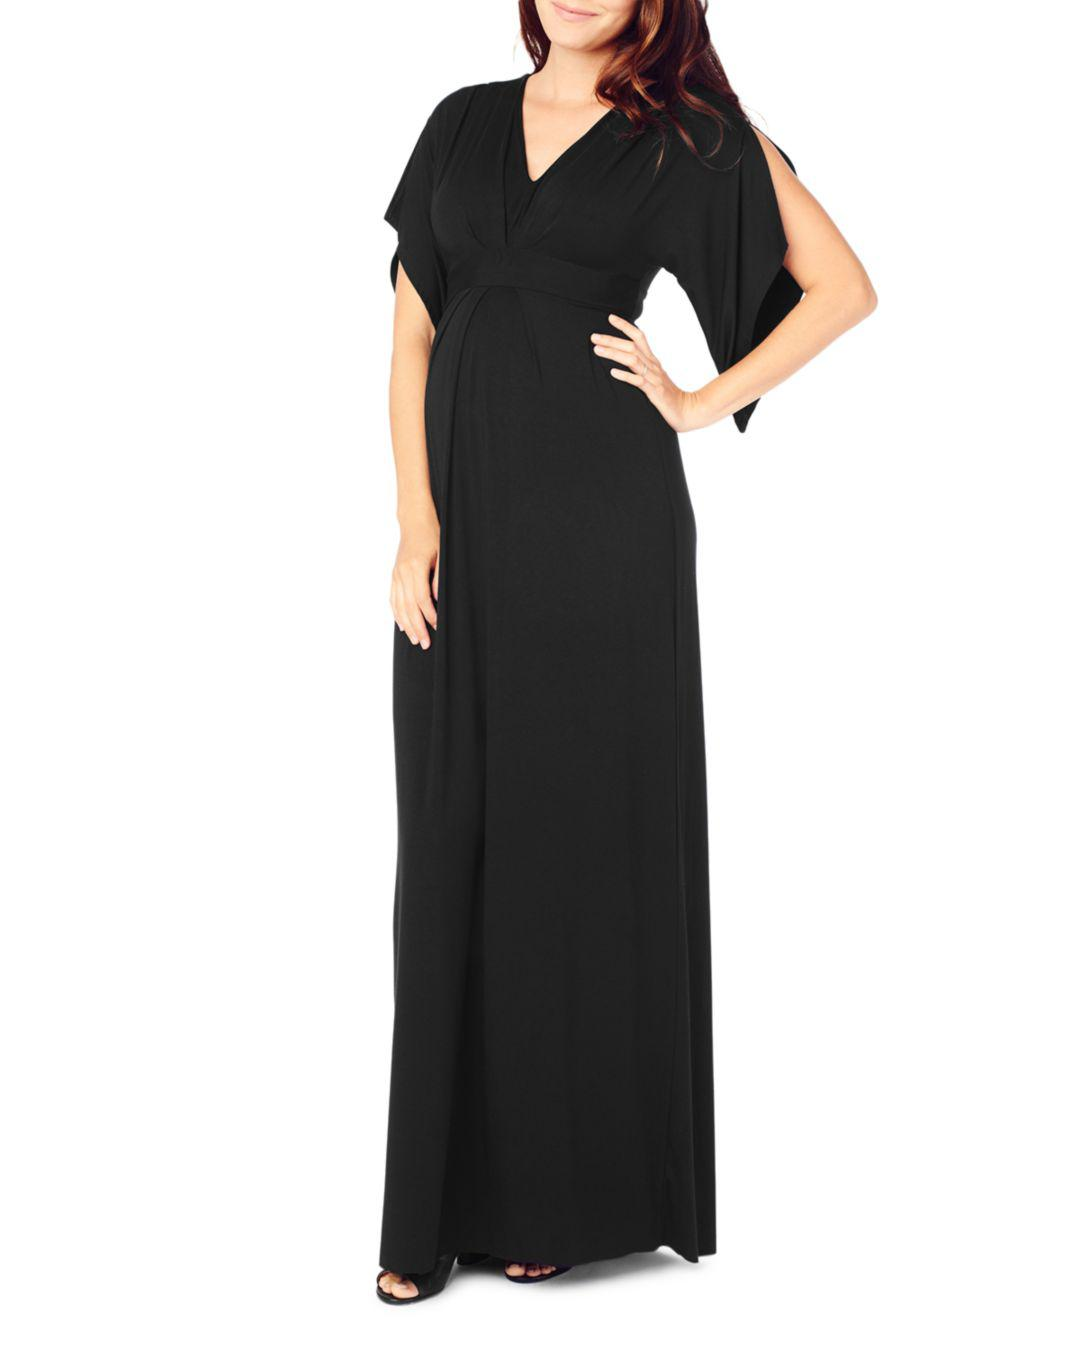 fae7d1ef1b33a Lyst - Ingrid & Isabel Maternity Kimono Maxi Dress in Black - Save 62%